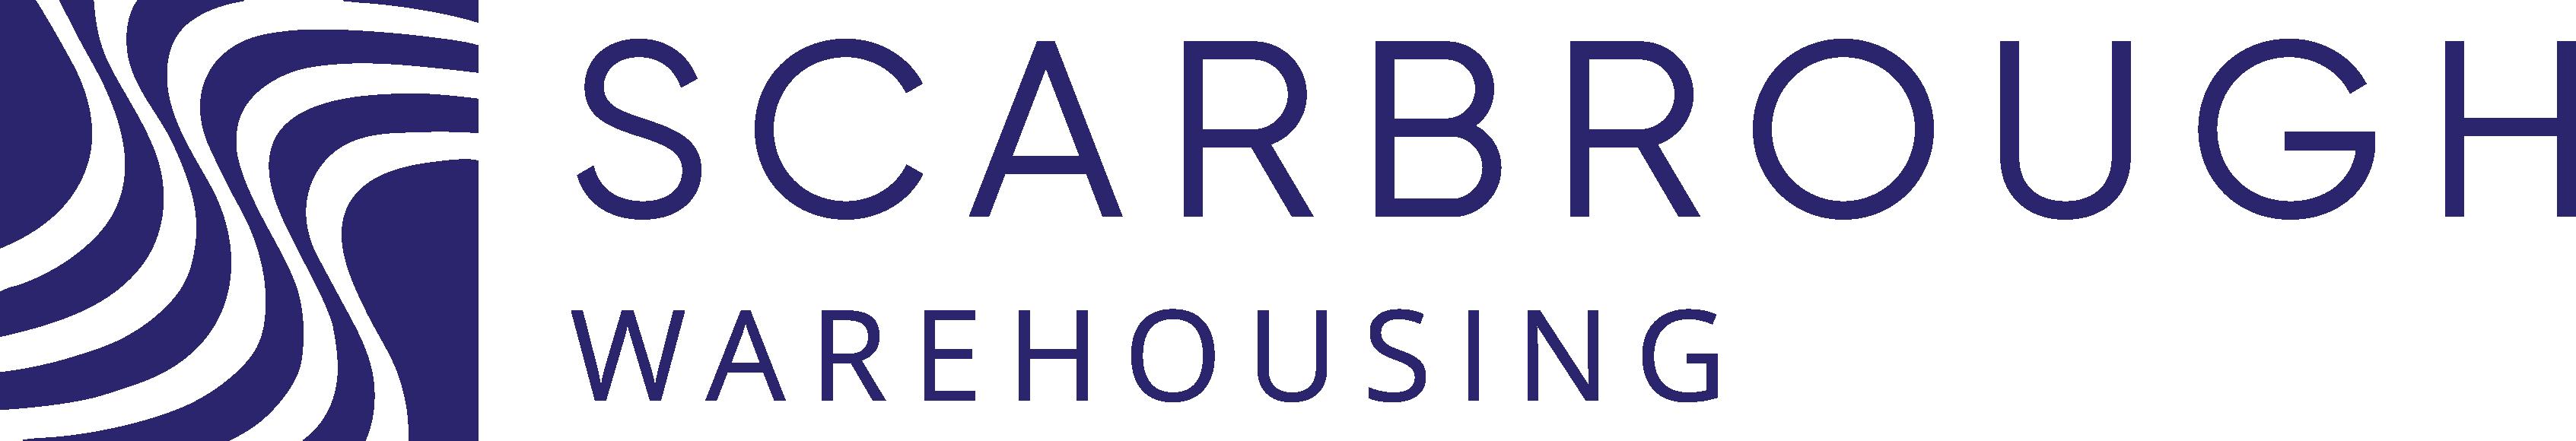 Scarbrough Warehousing